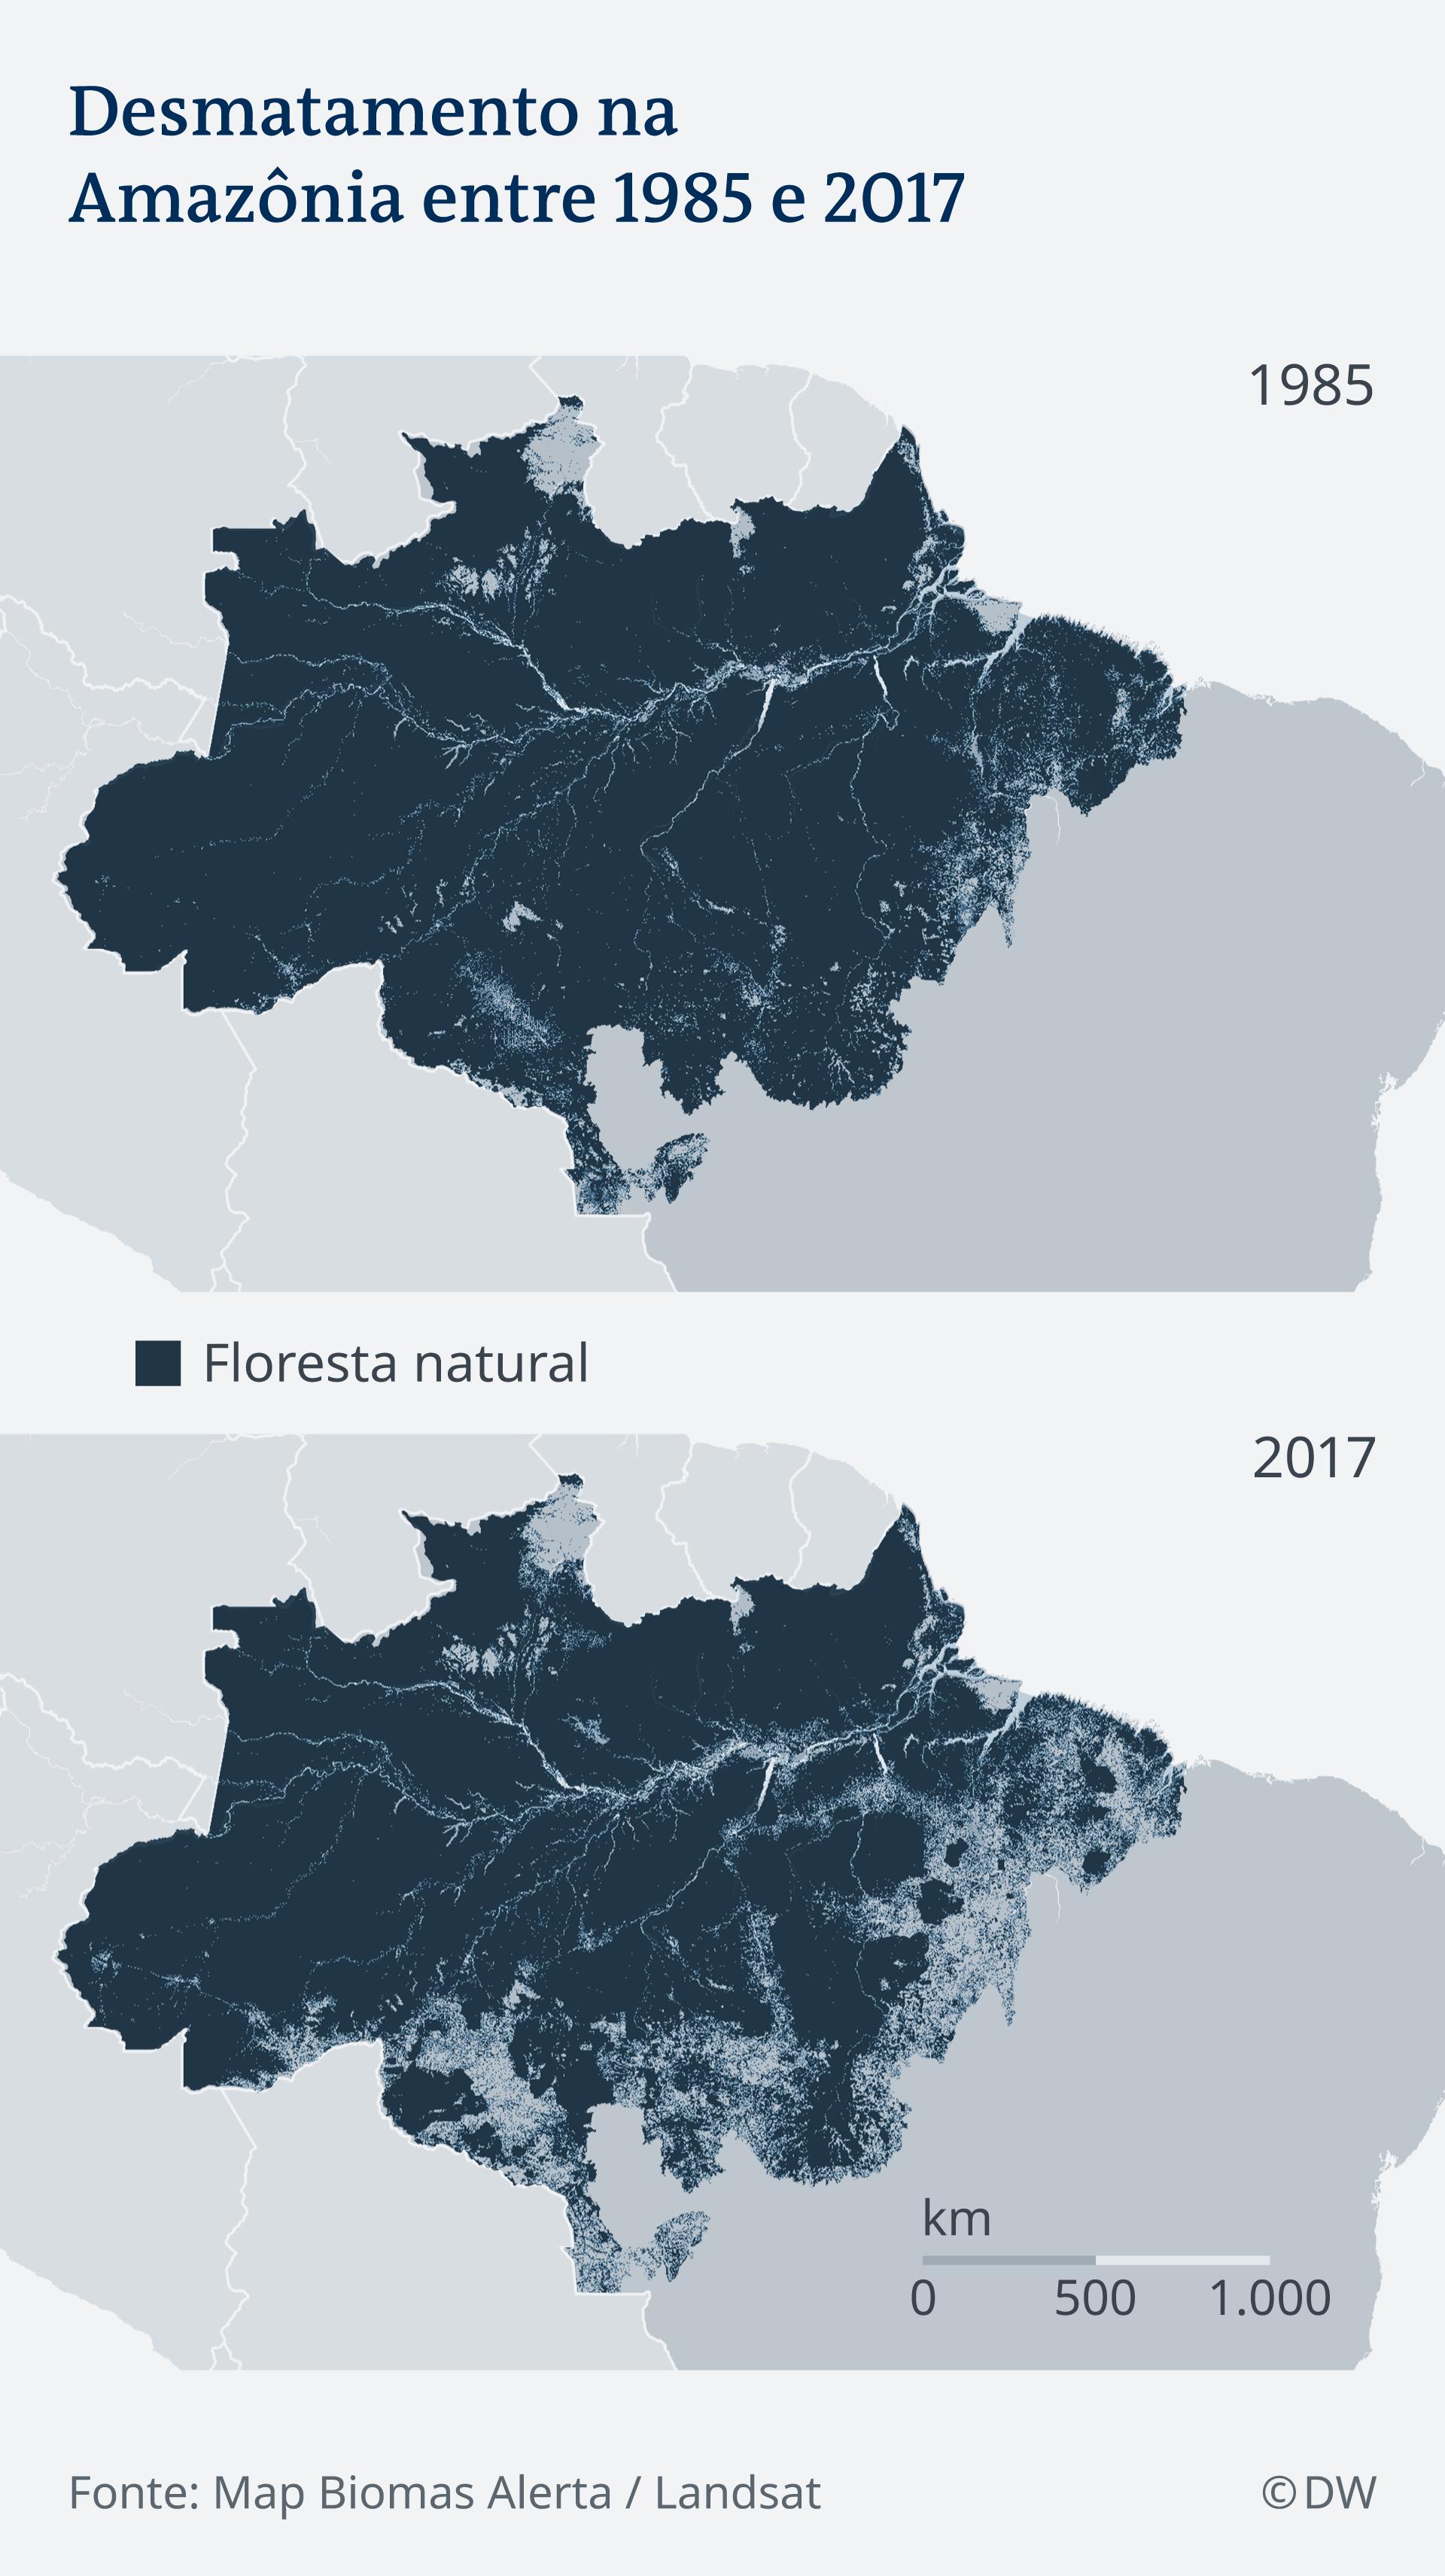 Infográfico sobre o desmatamento na Amazônia